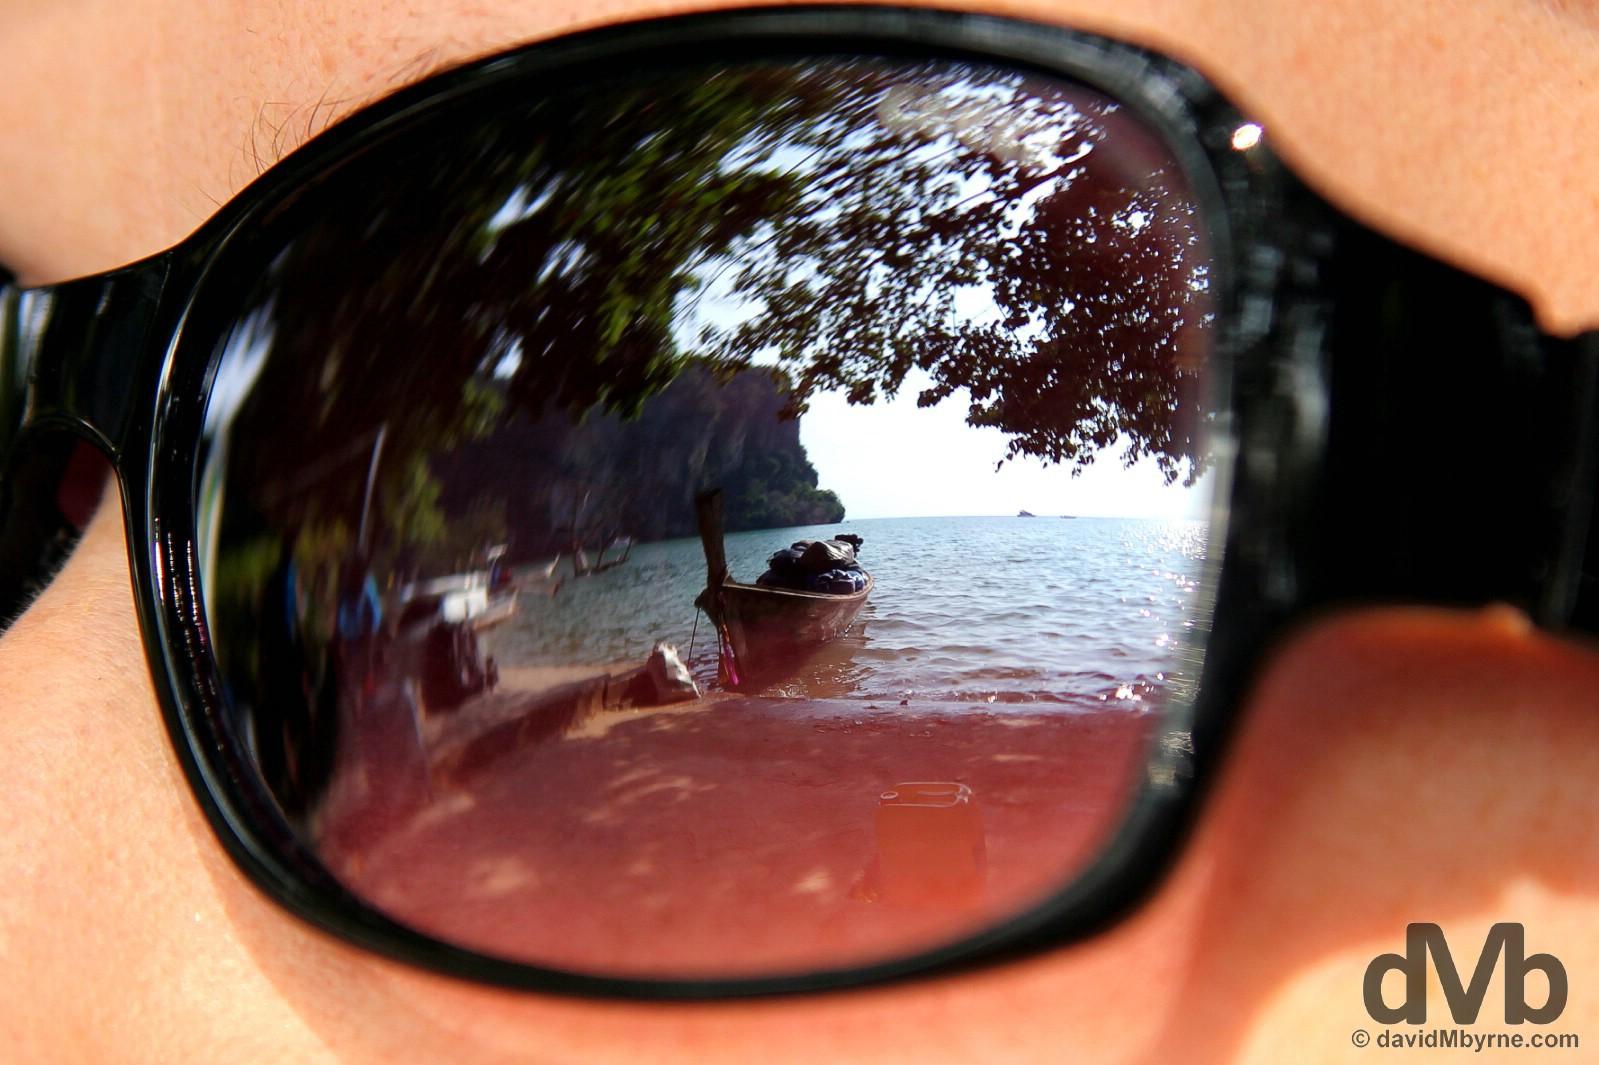 Long-tail boat reflections on Hat Rai Leh West Beach, Krabi, Thailand, Thailand. March 20, 2012.